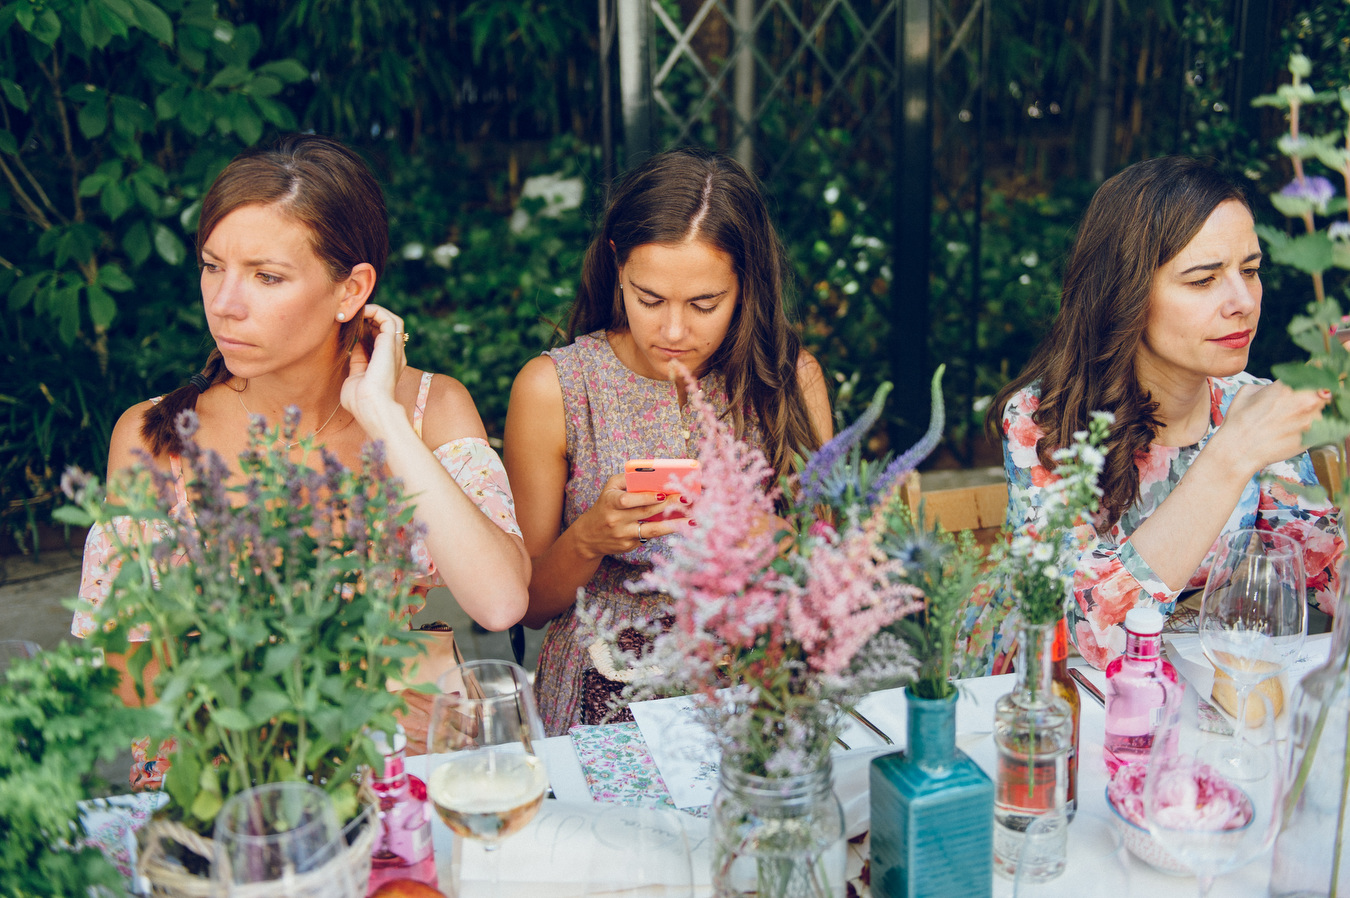 calista-one-lista-de-bodas-online-blog-de-bodas-calista-one-summer-party-2016-invitados-8